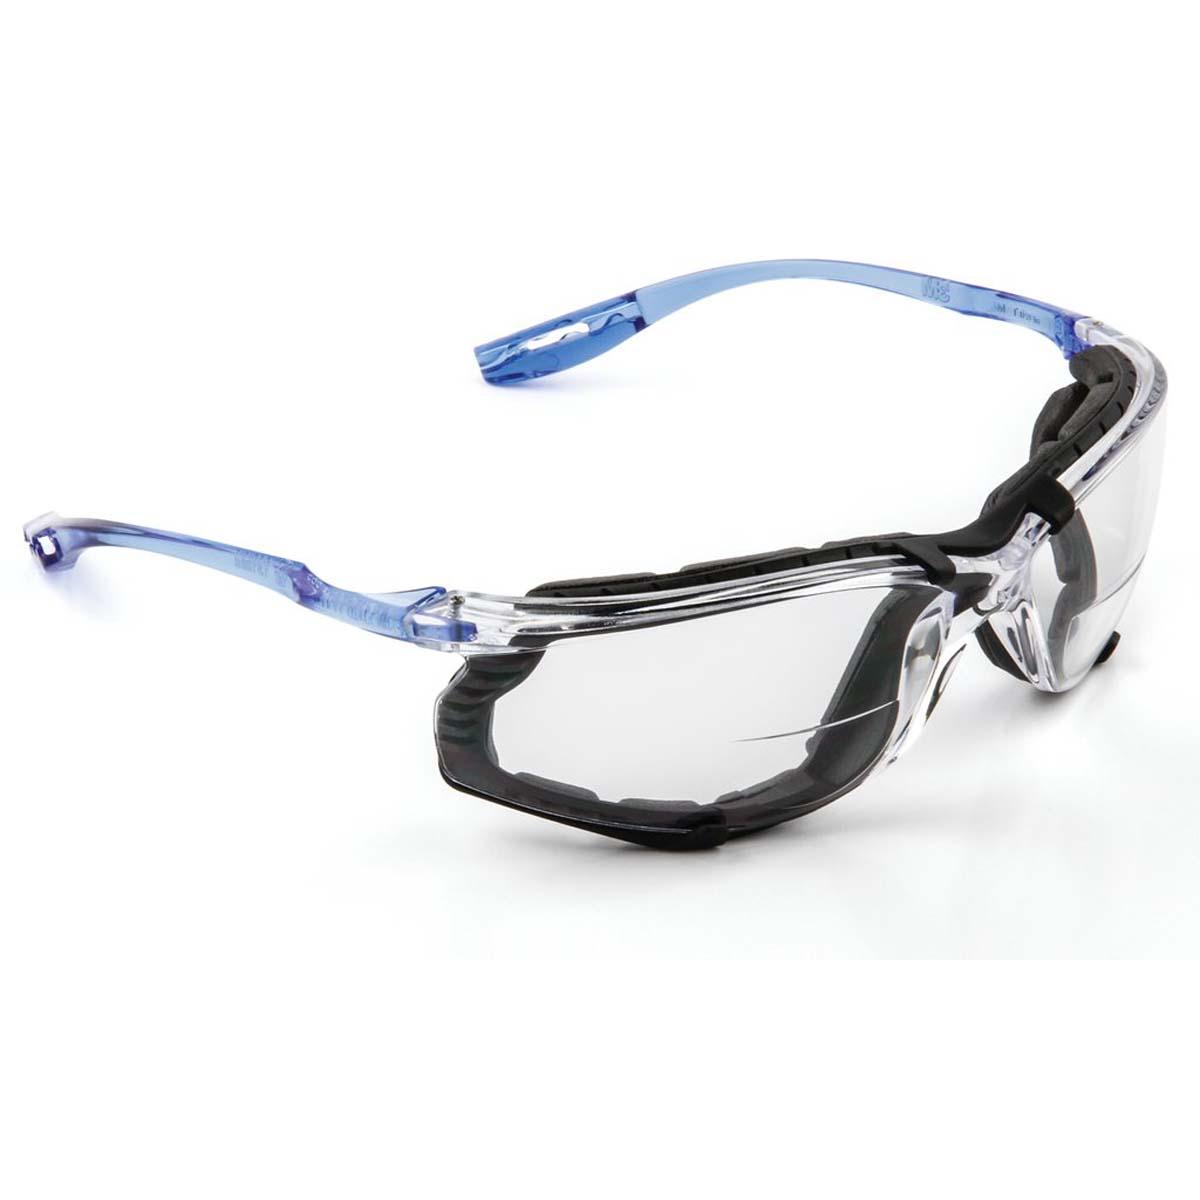 "3Mâ""¢ Virtuaâ""¢ CCS Protective Eyewear with Foam Gasket, VC215AF Clear +2.5D Anti-Fog Lens,"